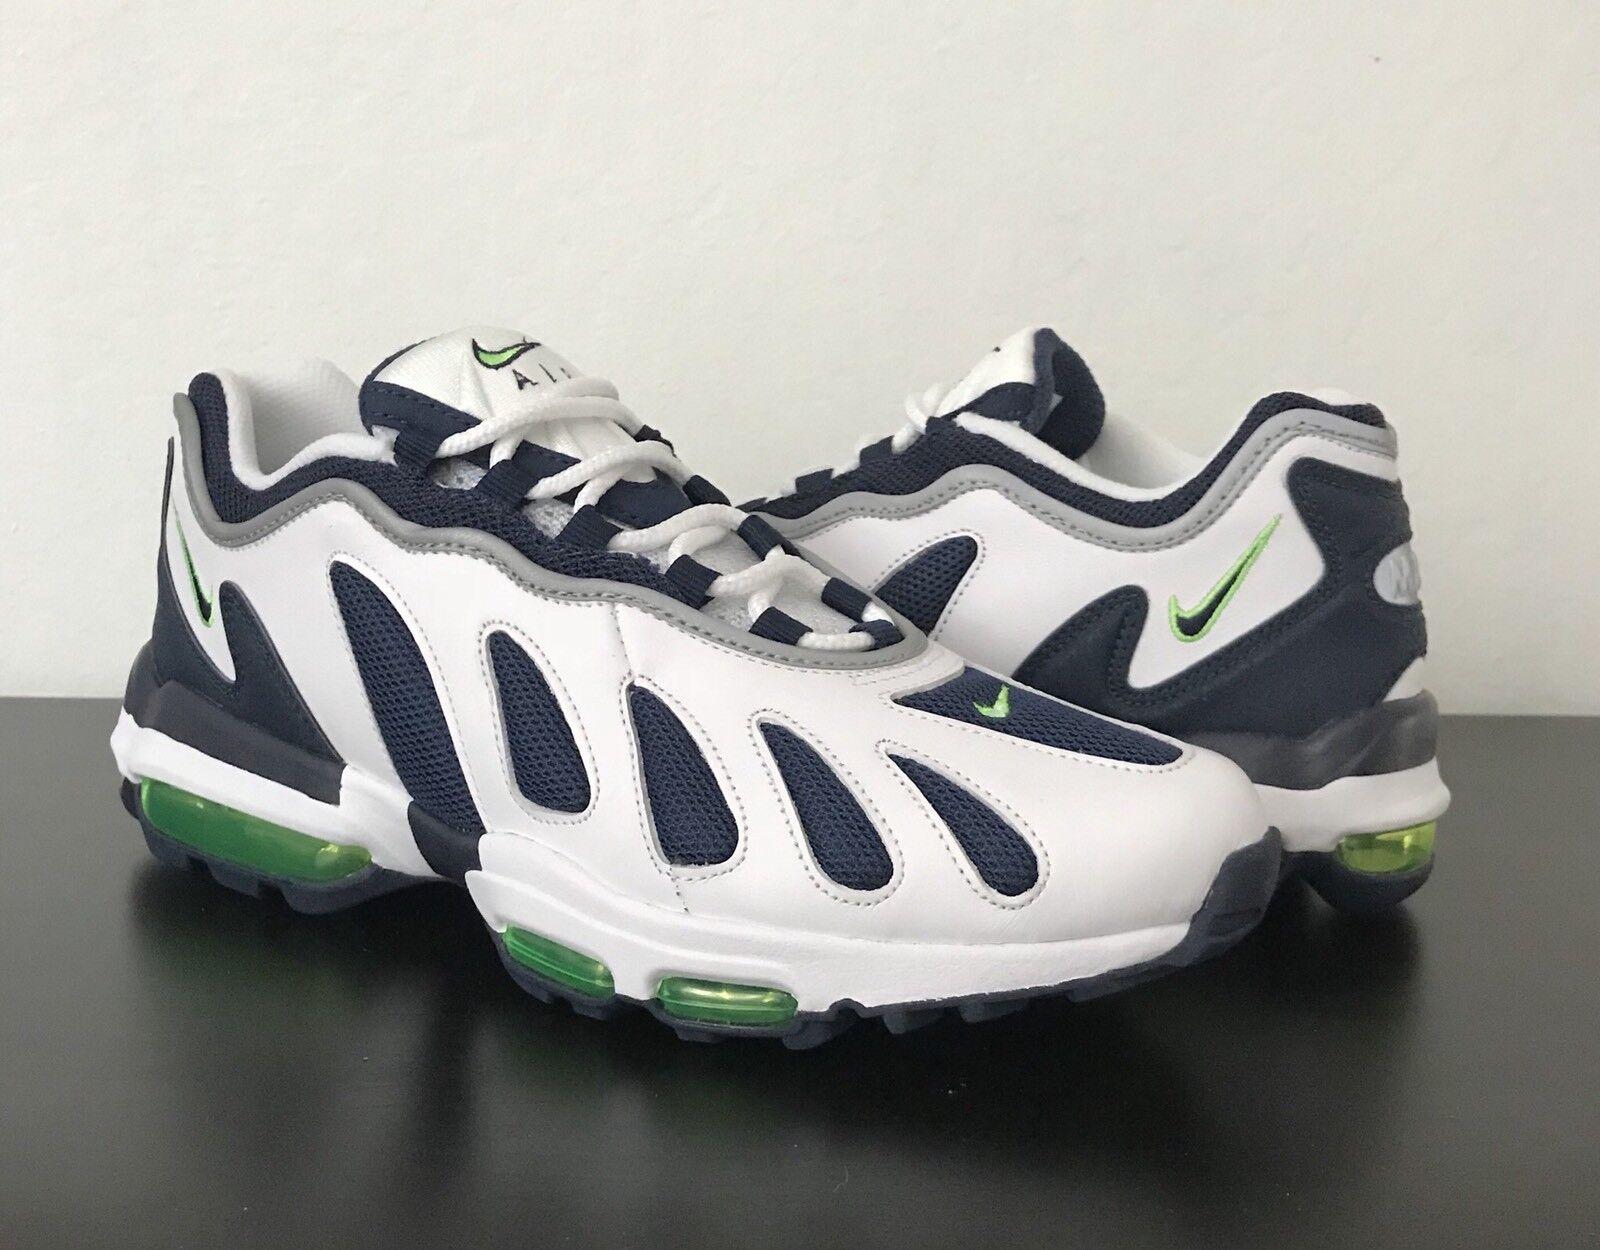 Nike Air Max 96 XX Obsidian-Scream Green 870165 100 Size 9